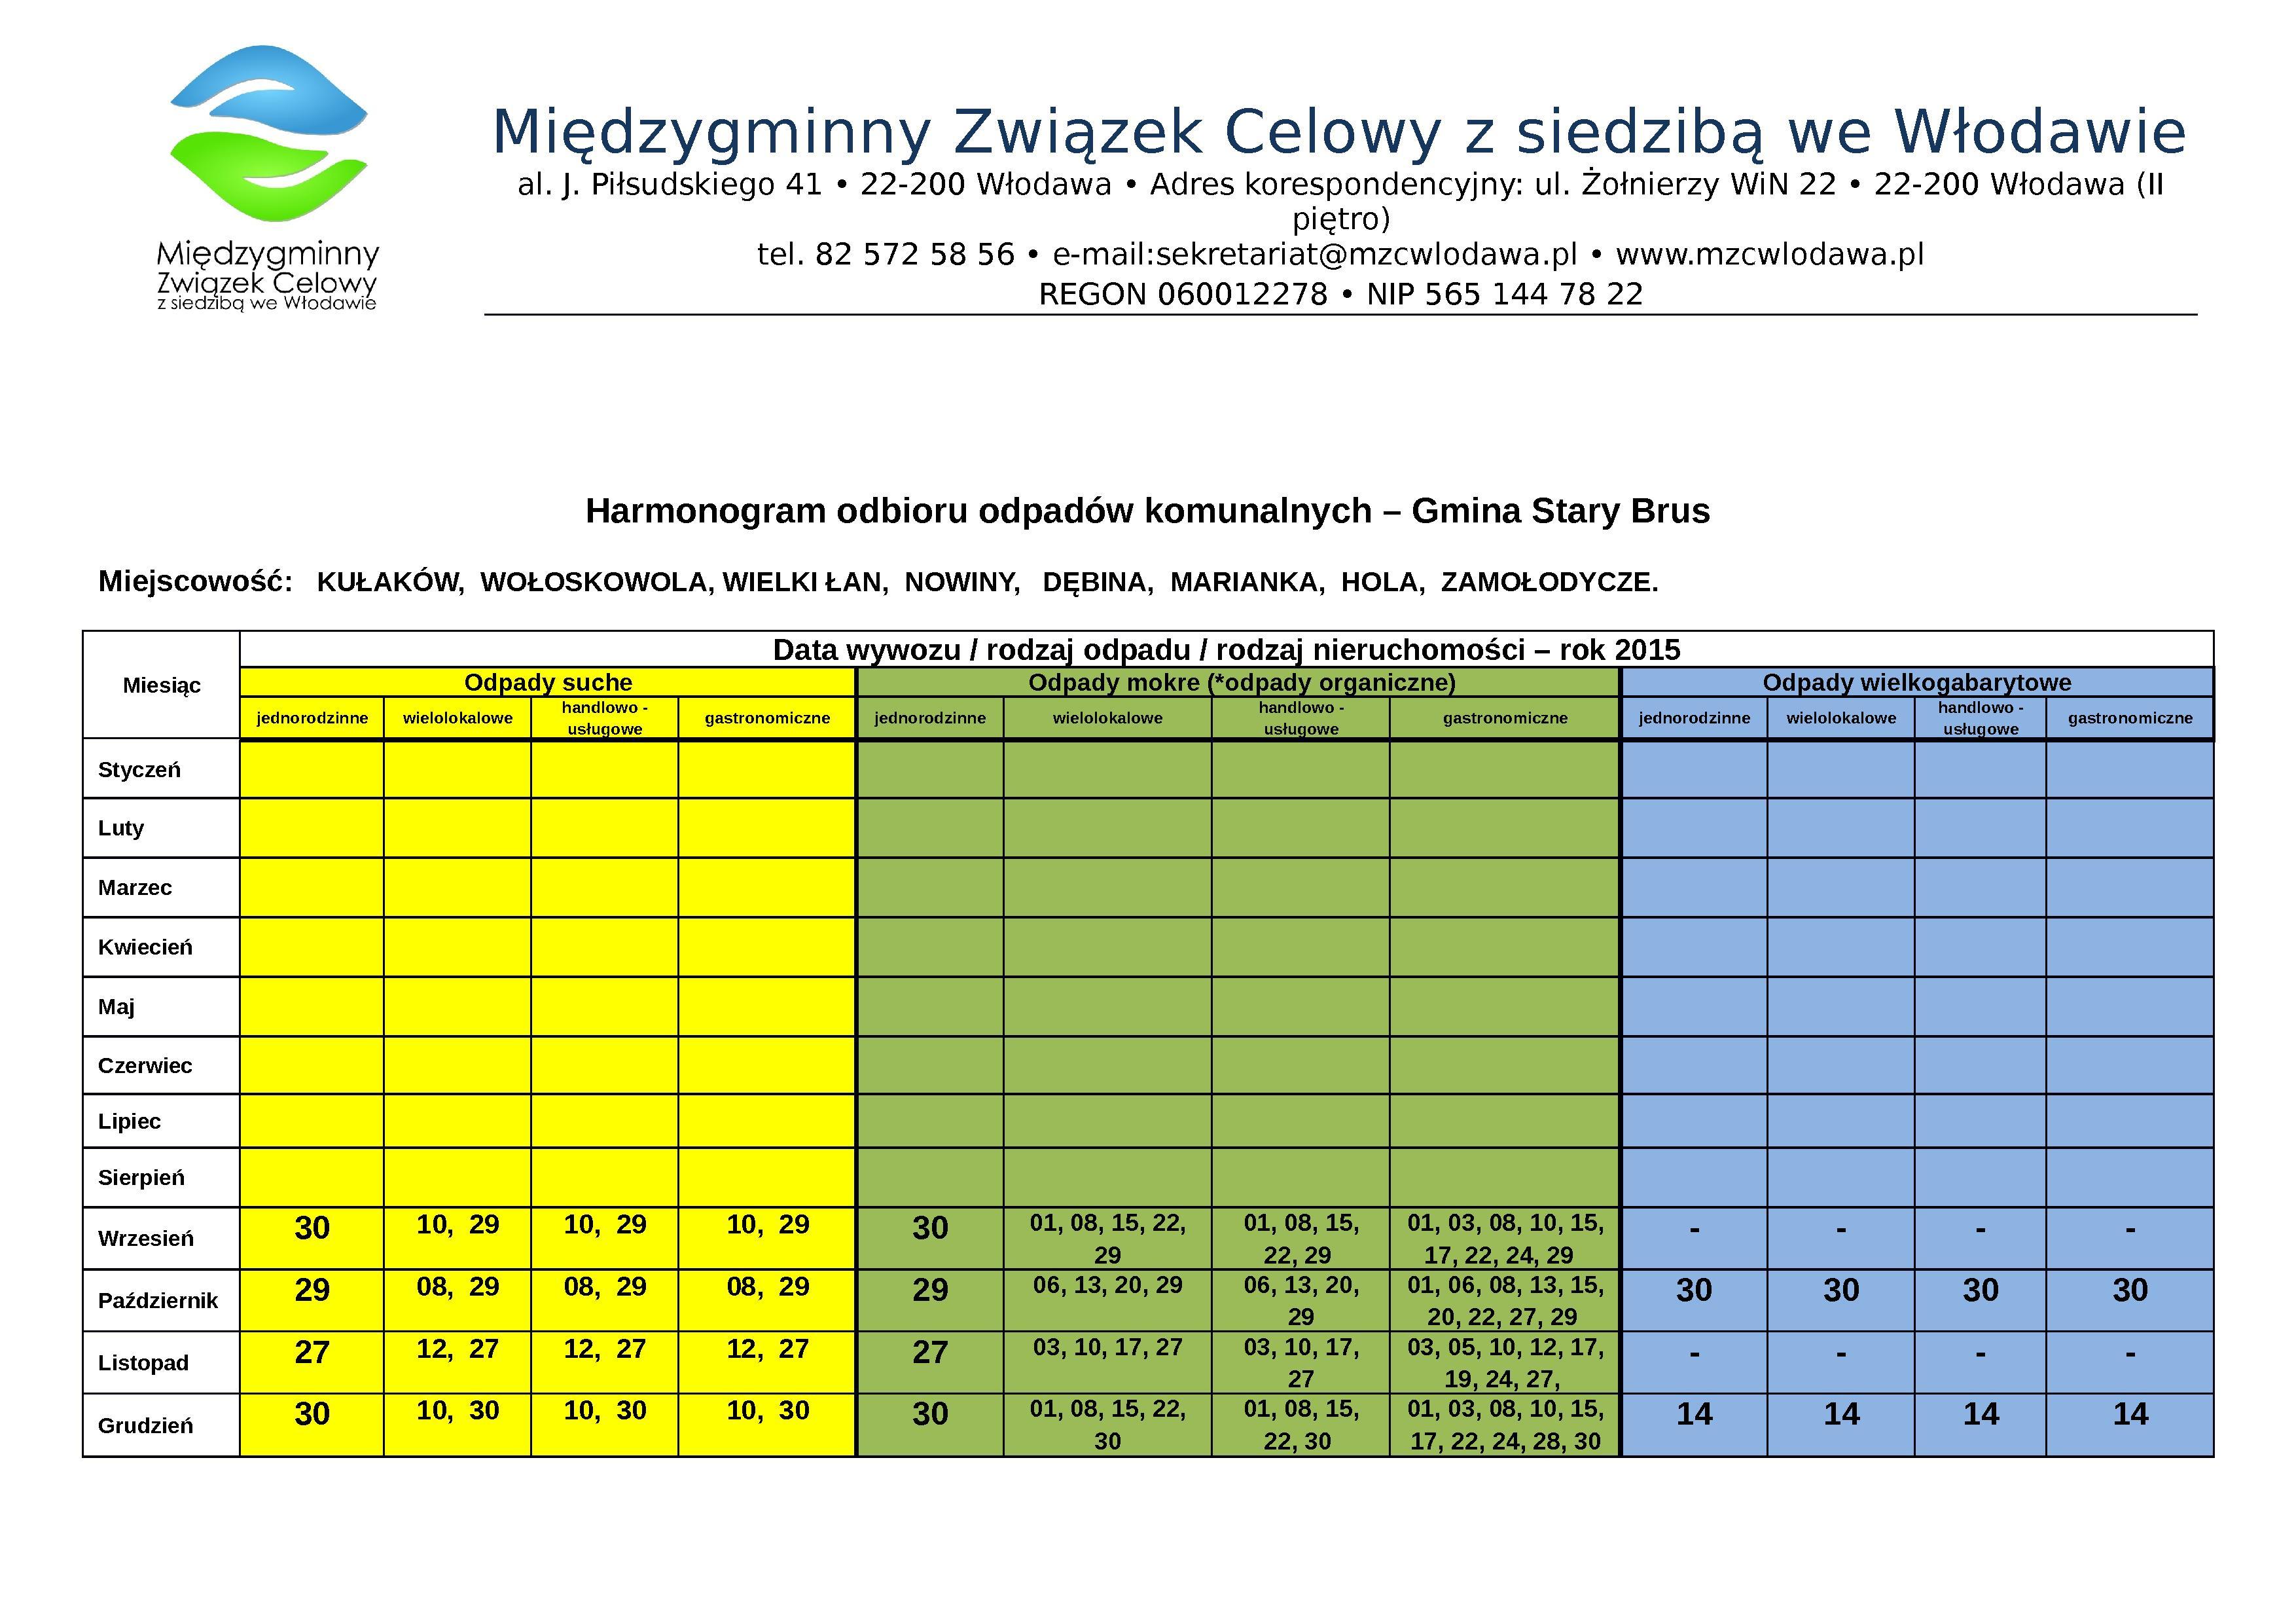 Harmonogram odb odp kom Stary Brus 2.pdf.03